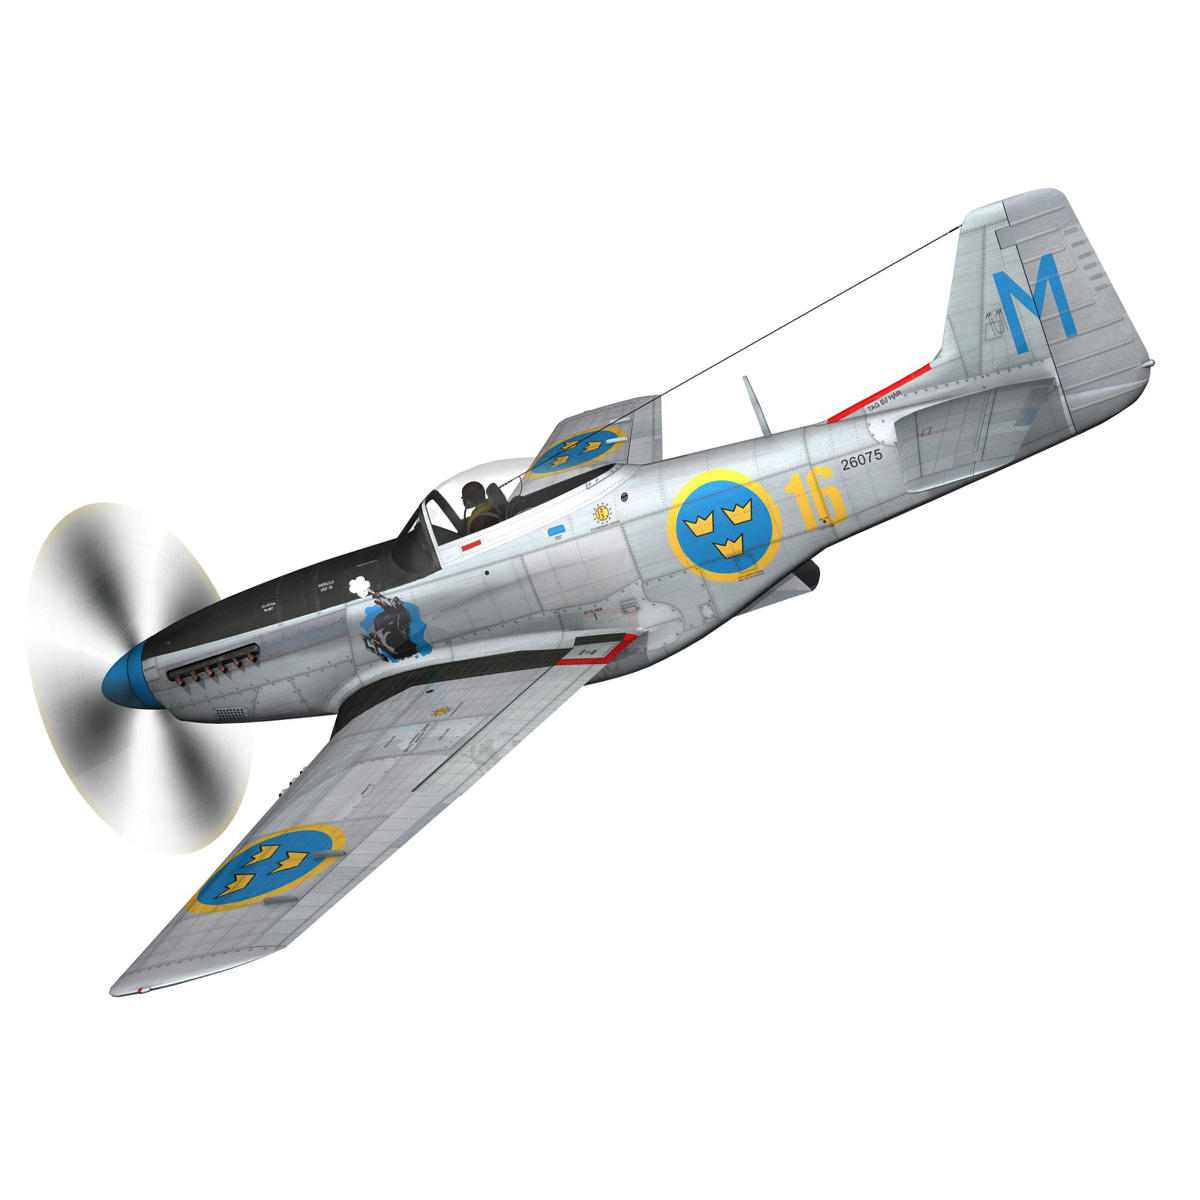 north american p-51d mustang – swedisch airforce 3d model fbx c4d lwo obj 268229